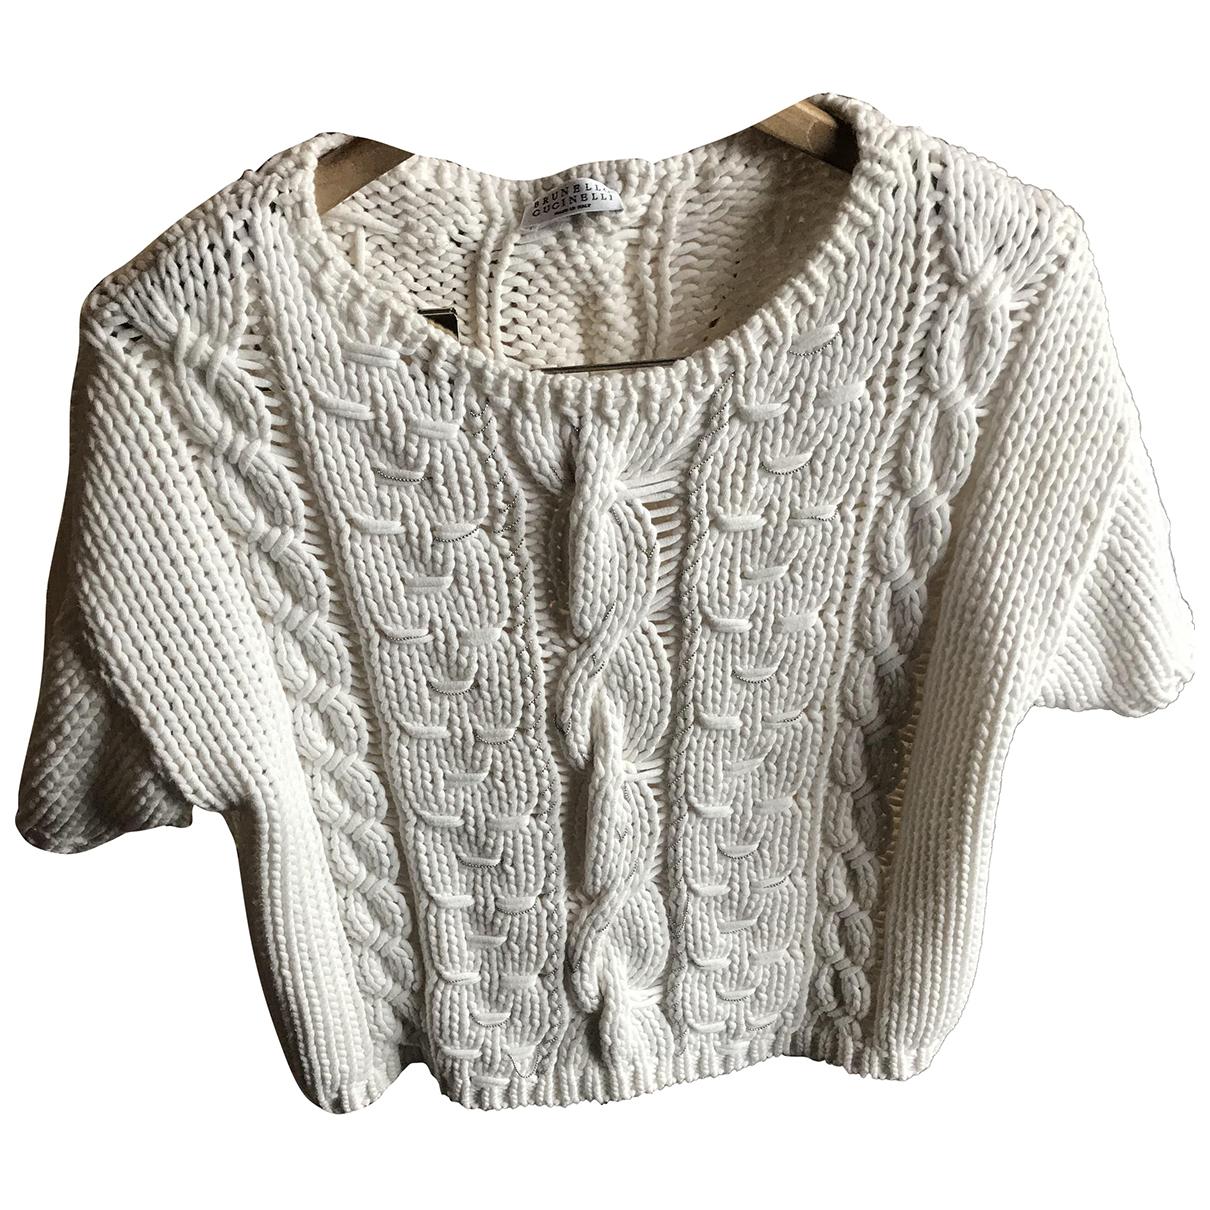 Brunello Cucinelli N White Cotton Knitwear for Women S International